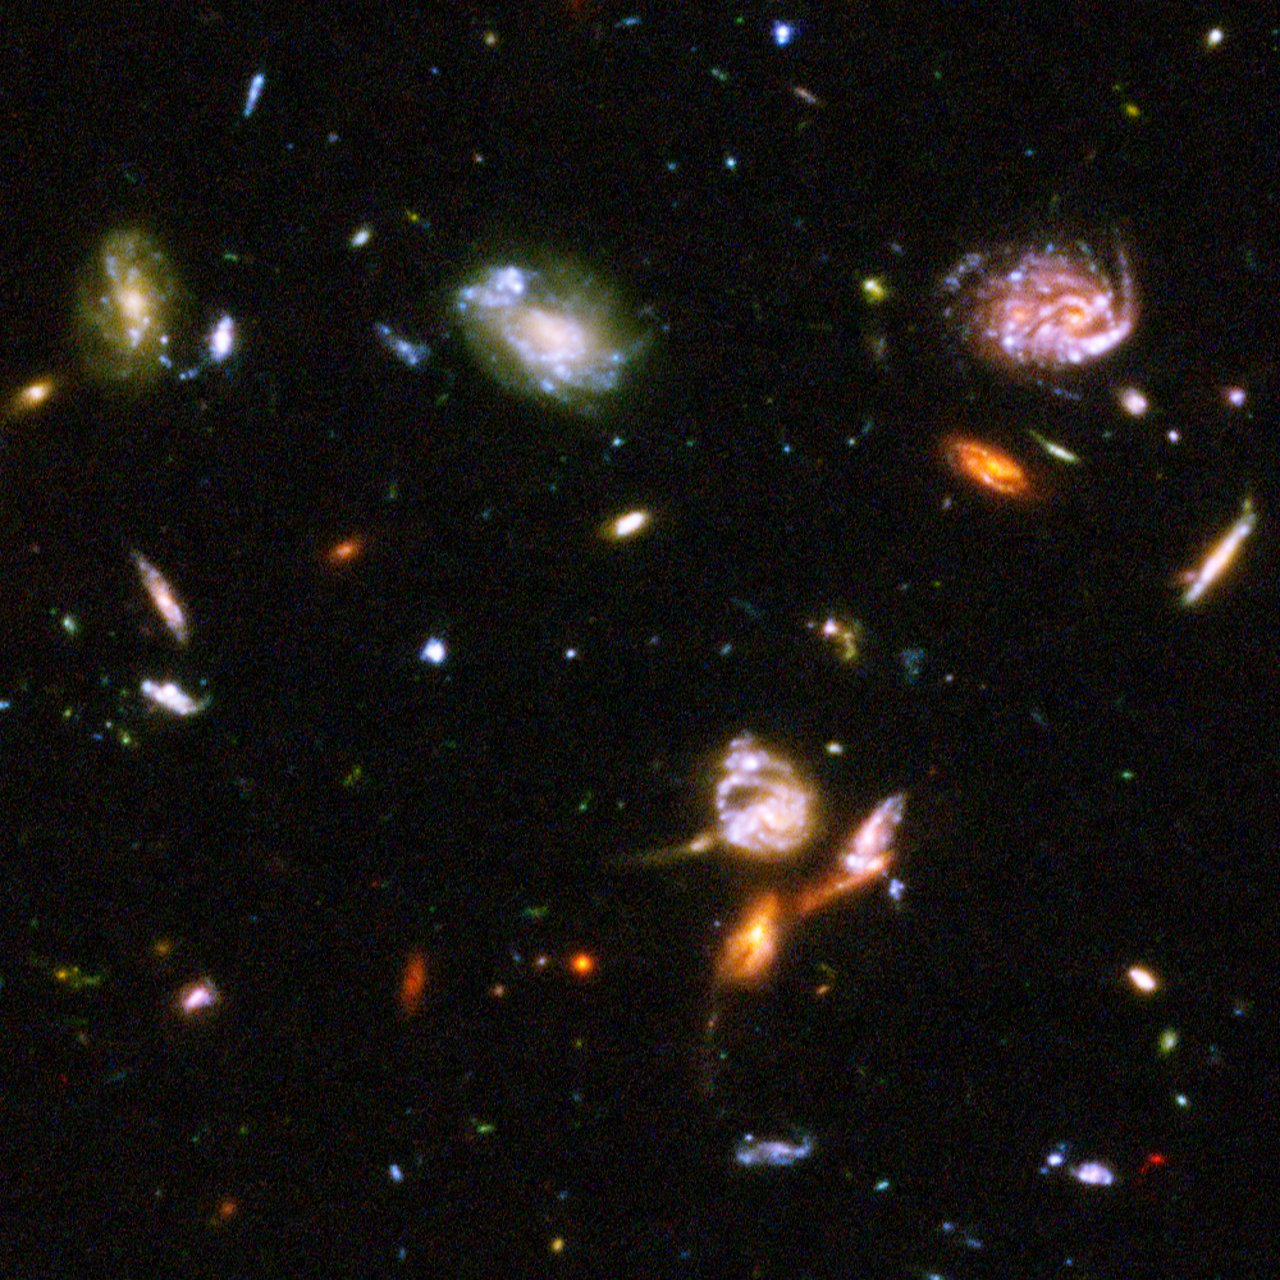 Hubble reveals galactic drama [image 1] | ESA/Hubble